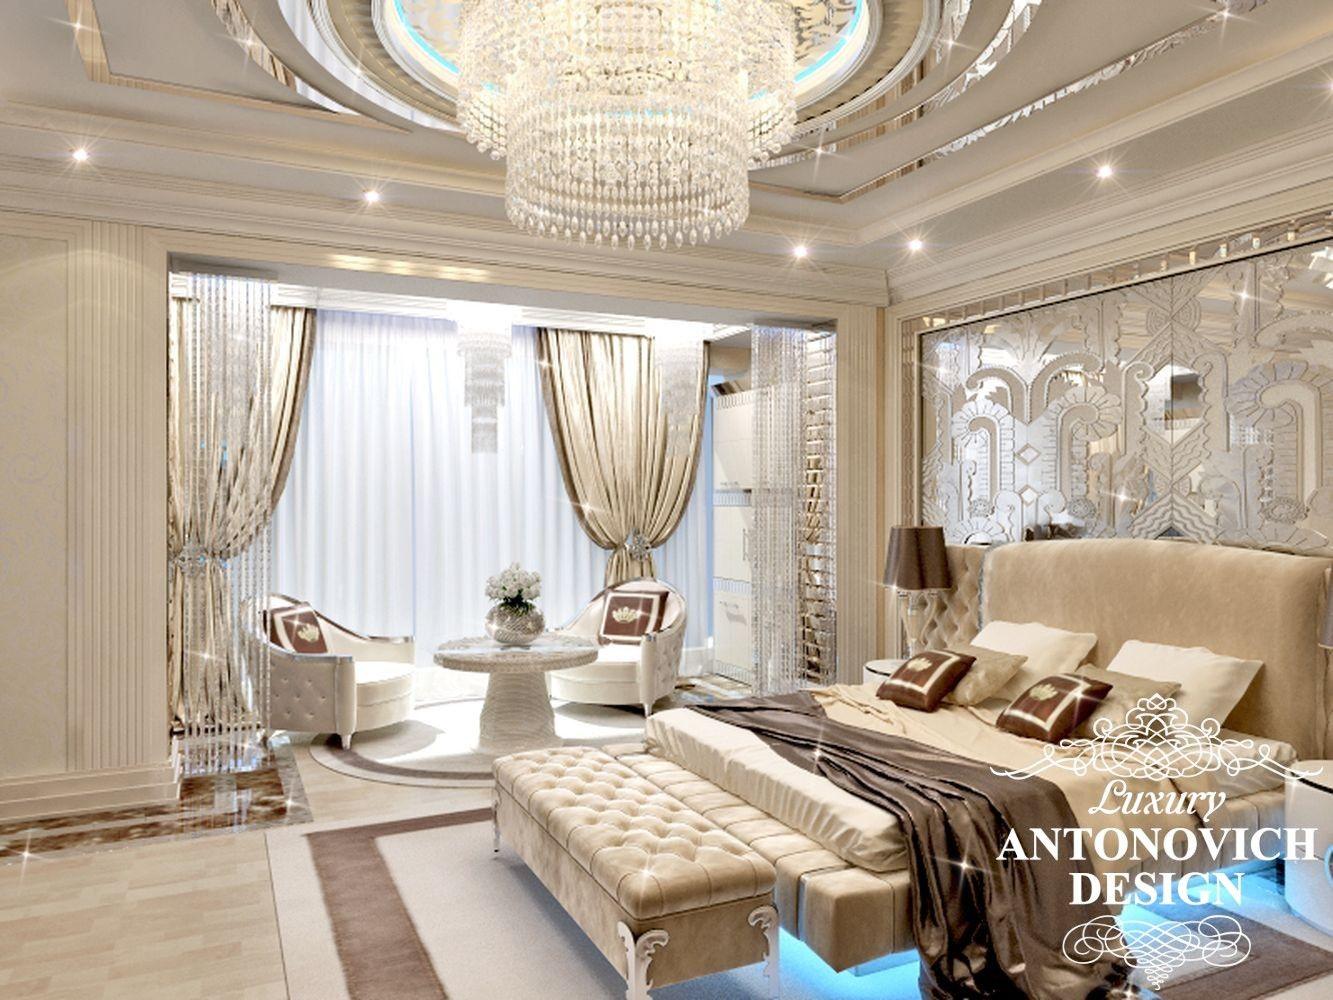 amazing decor | InTEriOR - EXteRIoR (Homes) 2 | Pinterest ...